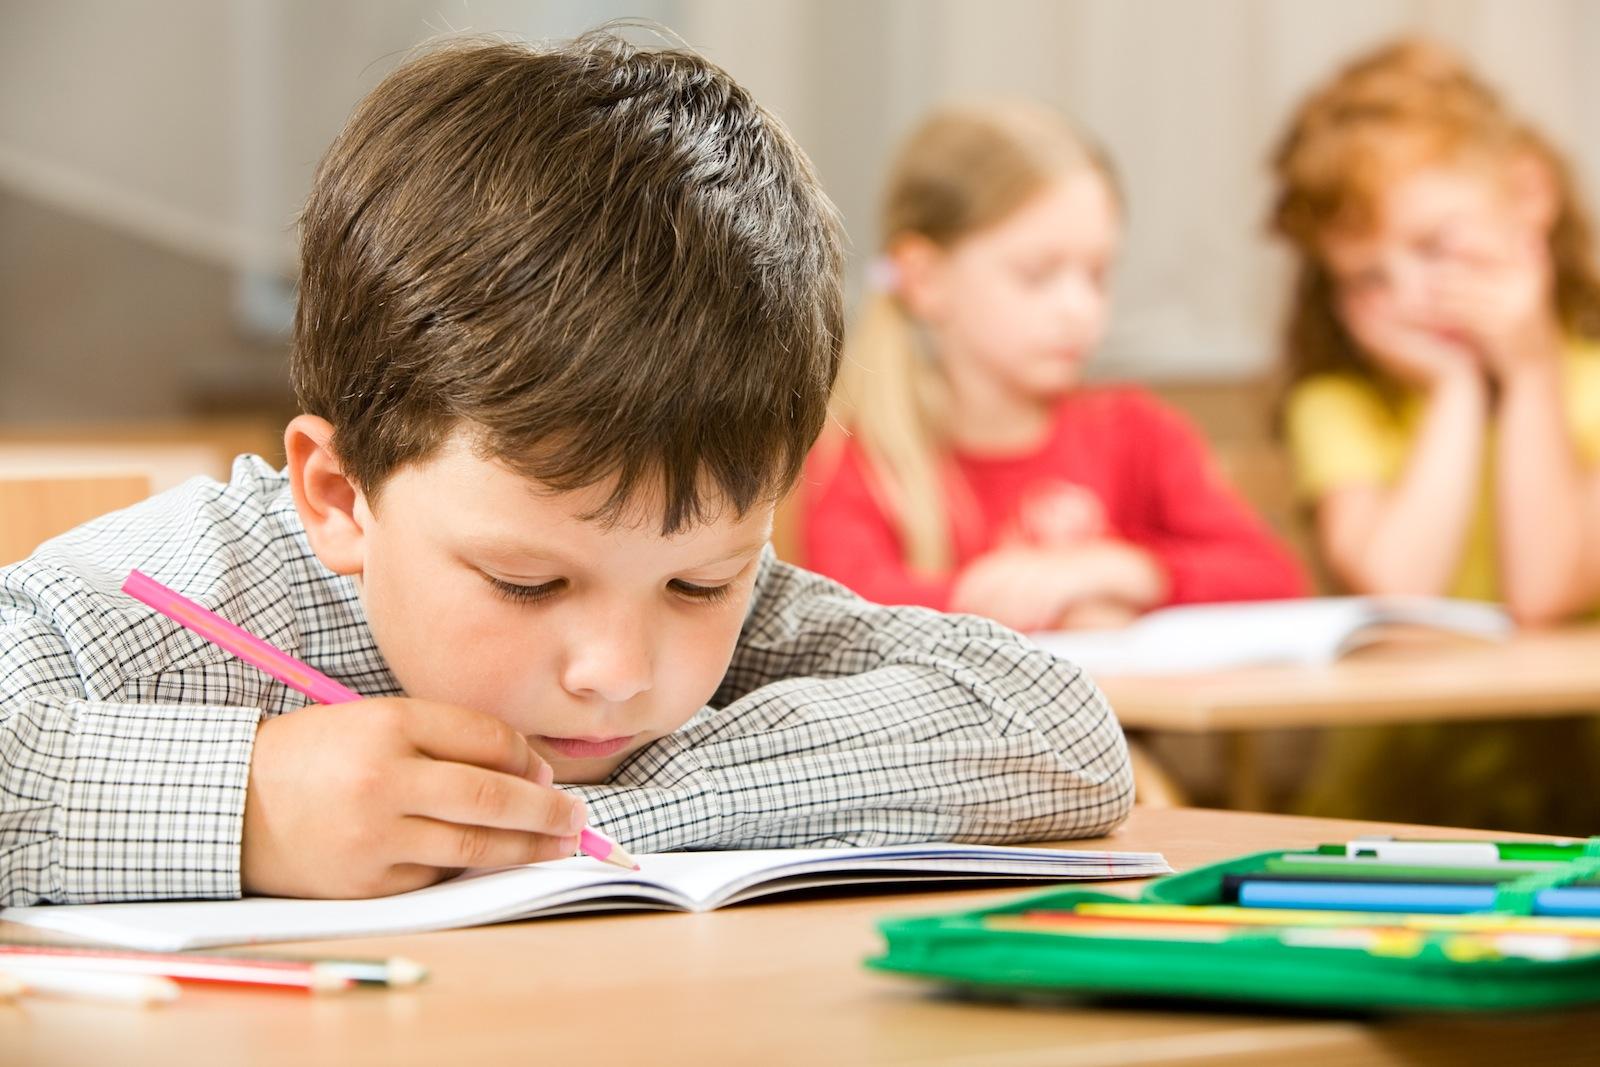 https://brocku.ca/brock-news/wp-content/uploads/2013/07/child-holding-pencil1.jpeg?0e4f1c